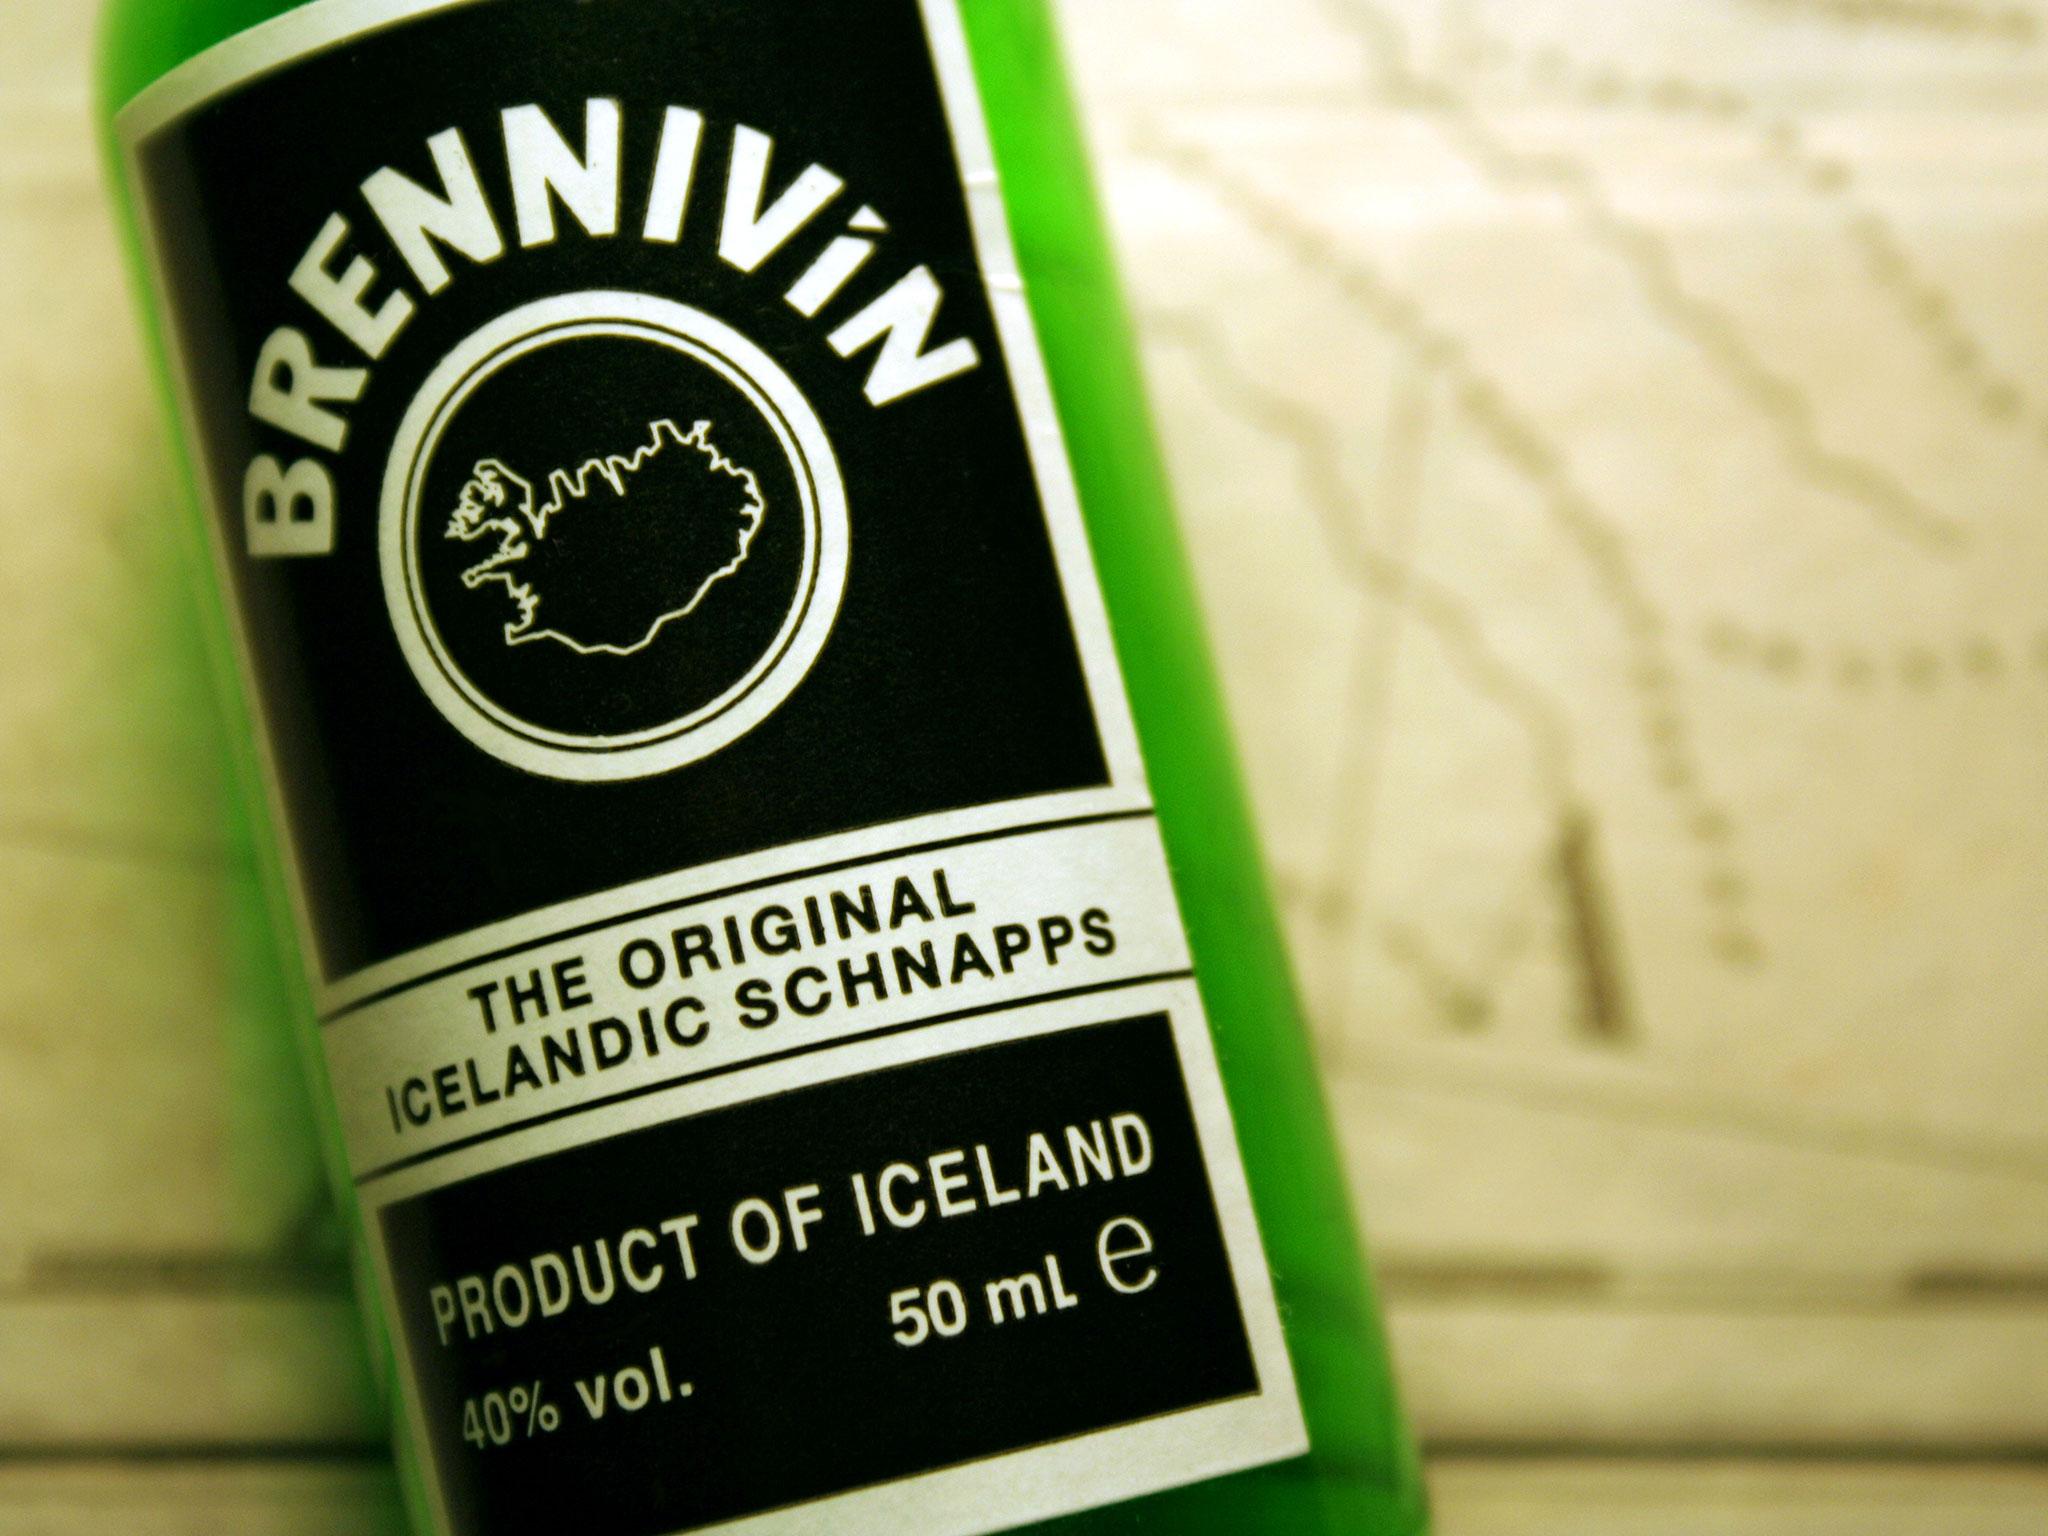 547f442c2a3d21fa285cc2d8_unusual-liquor-brennivin-iceland